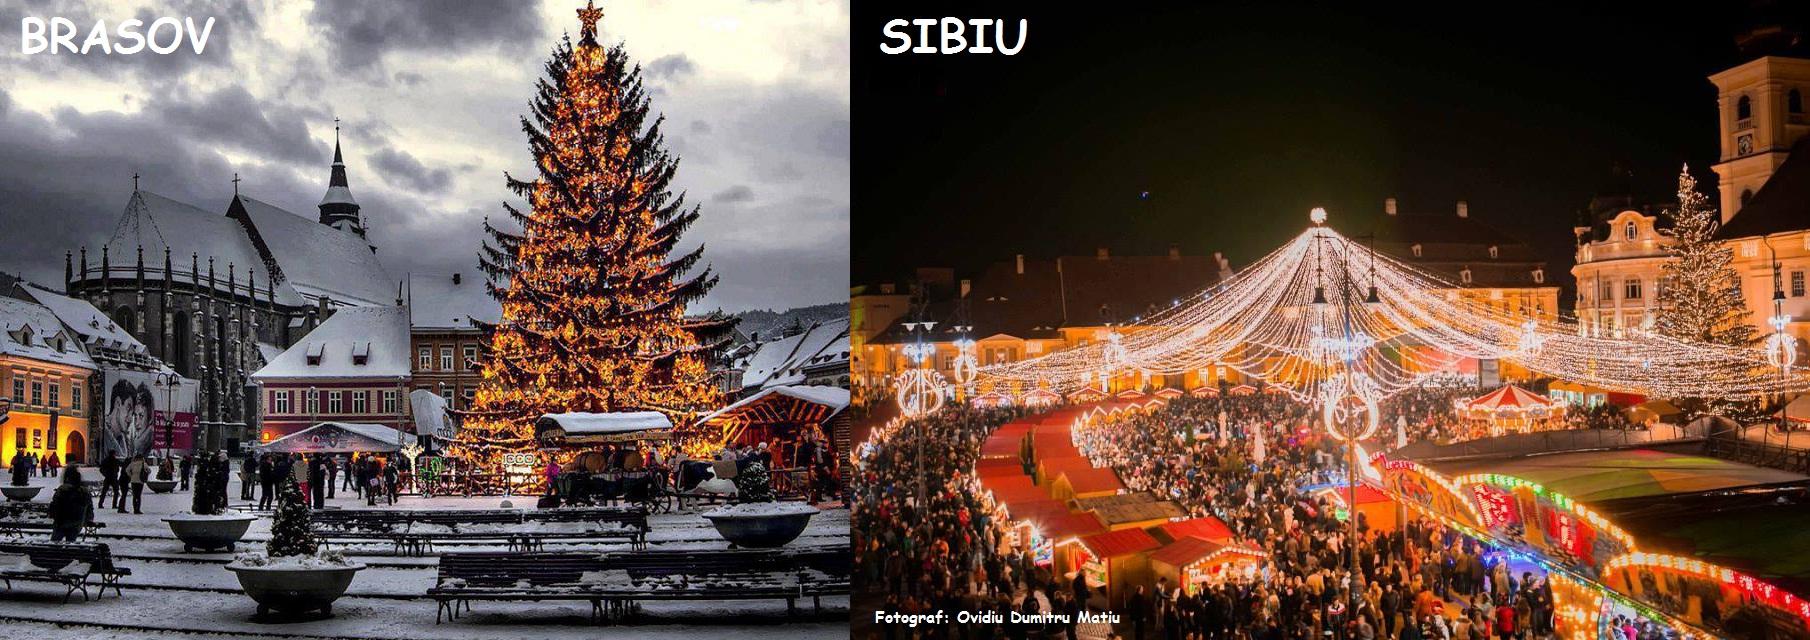 SIBIU-BRASOV